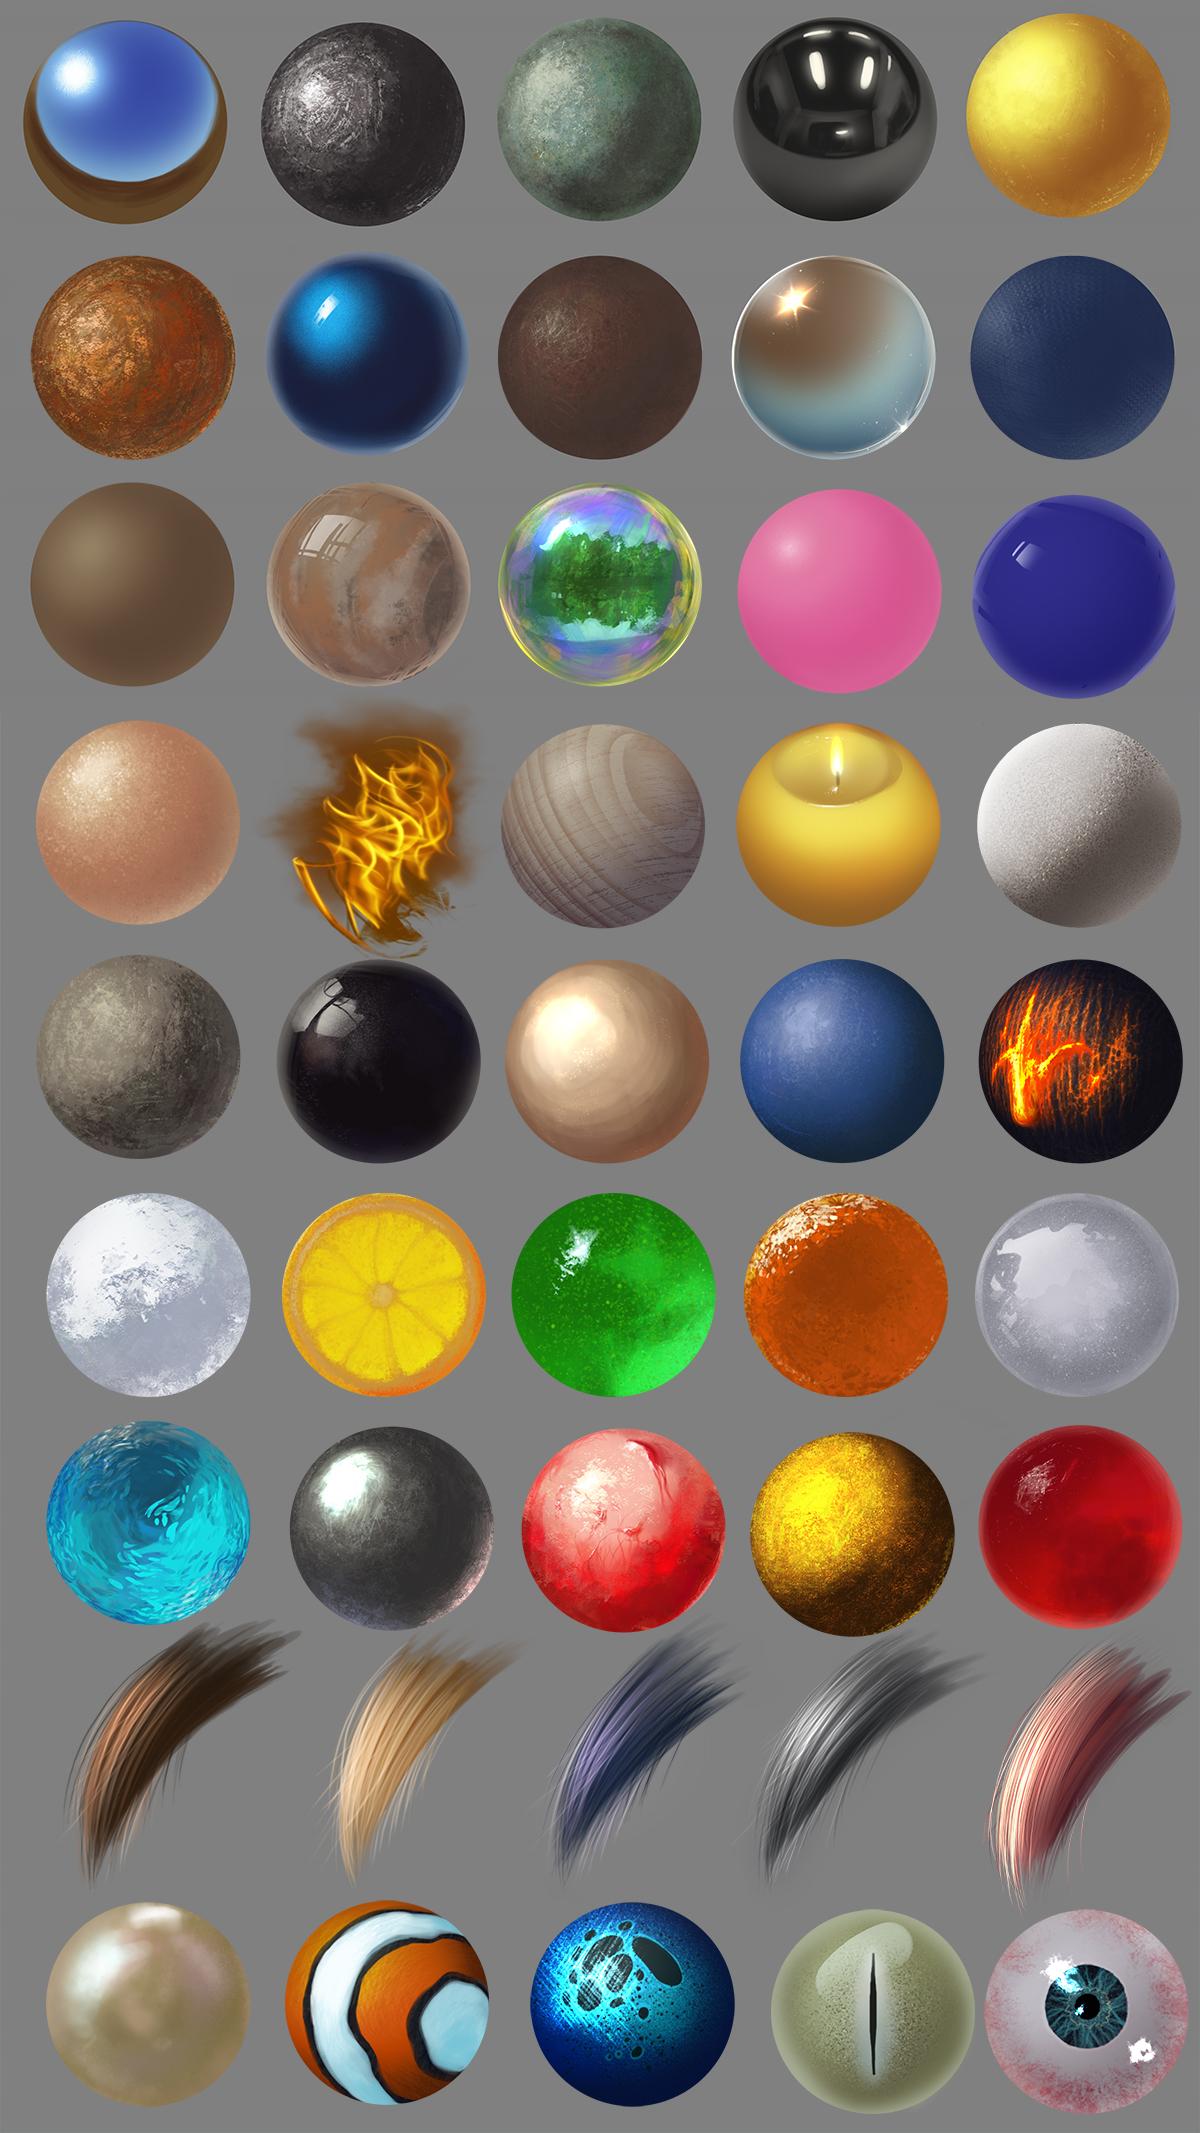 Practice at rendering different materials